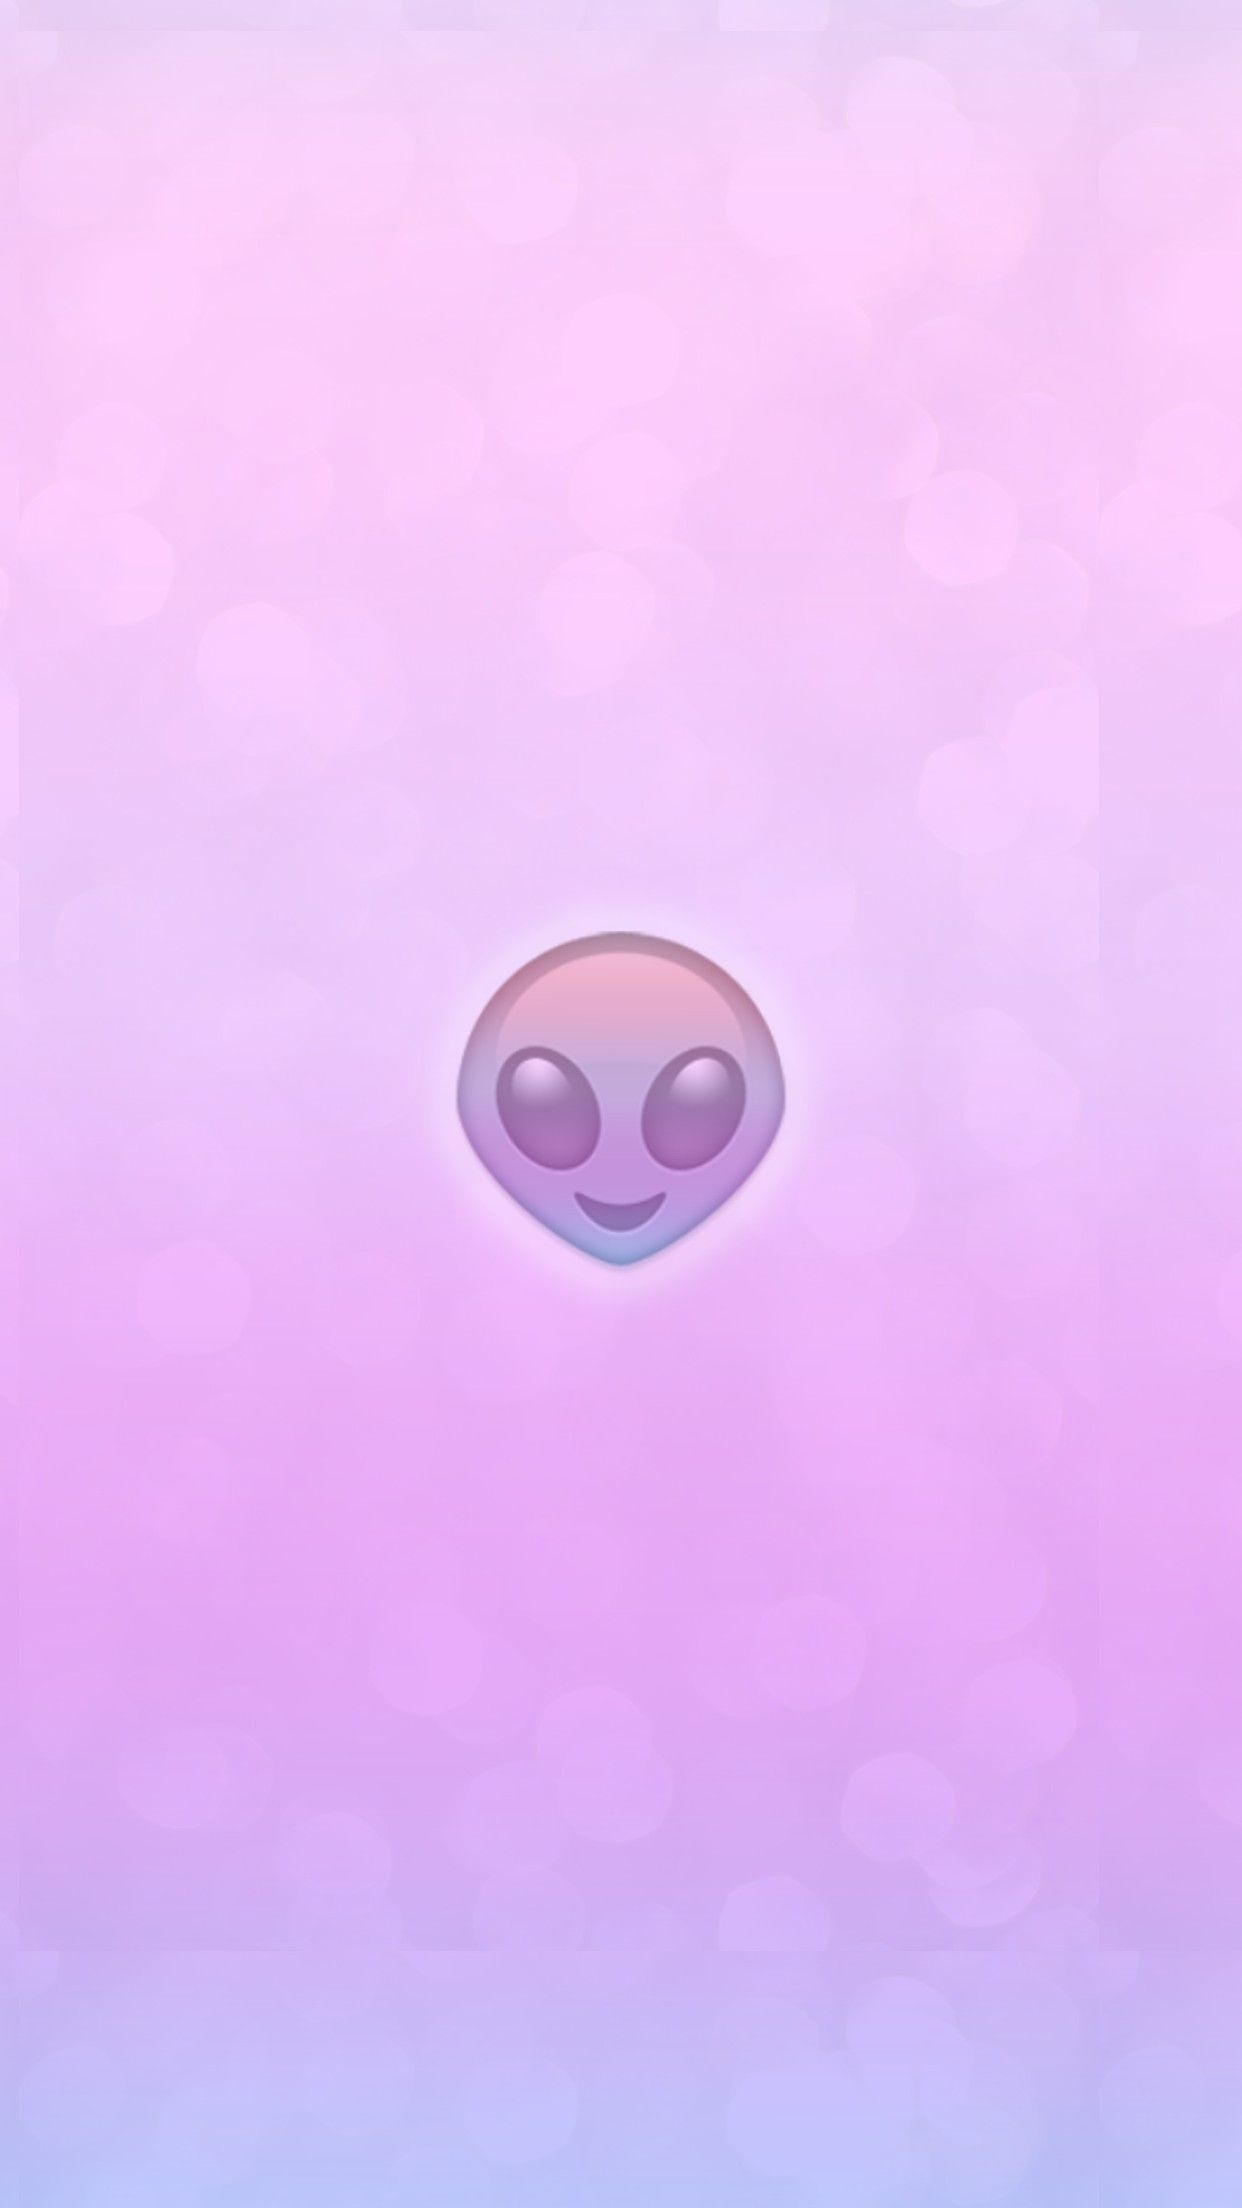 Wallpaper Background Iphone Android Hd Pink Purple Gradient Ombre Alien Emoji Iphone Wallpaper Emoji Wallpaper Iphone Emoji Wallpaper